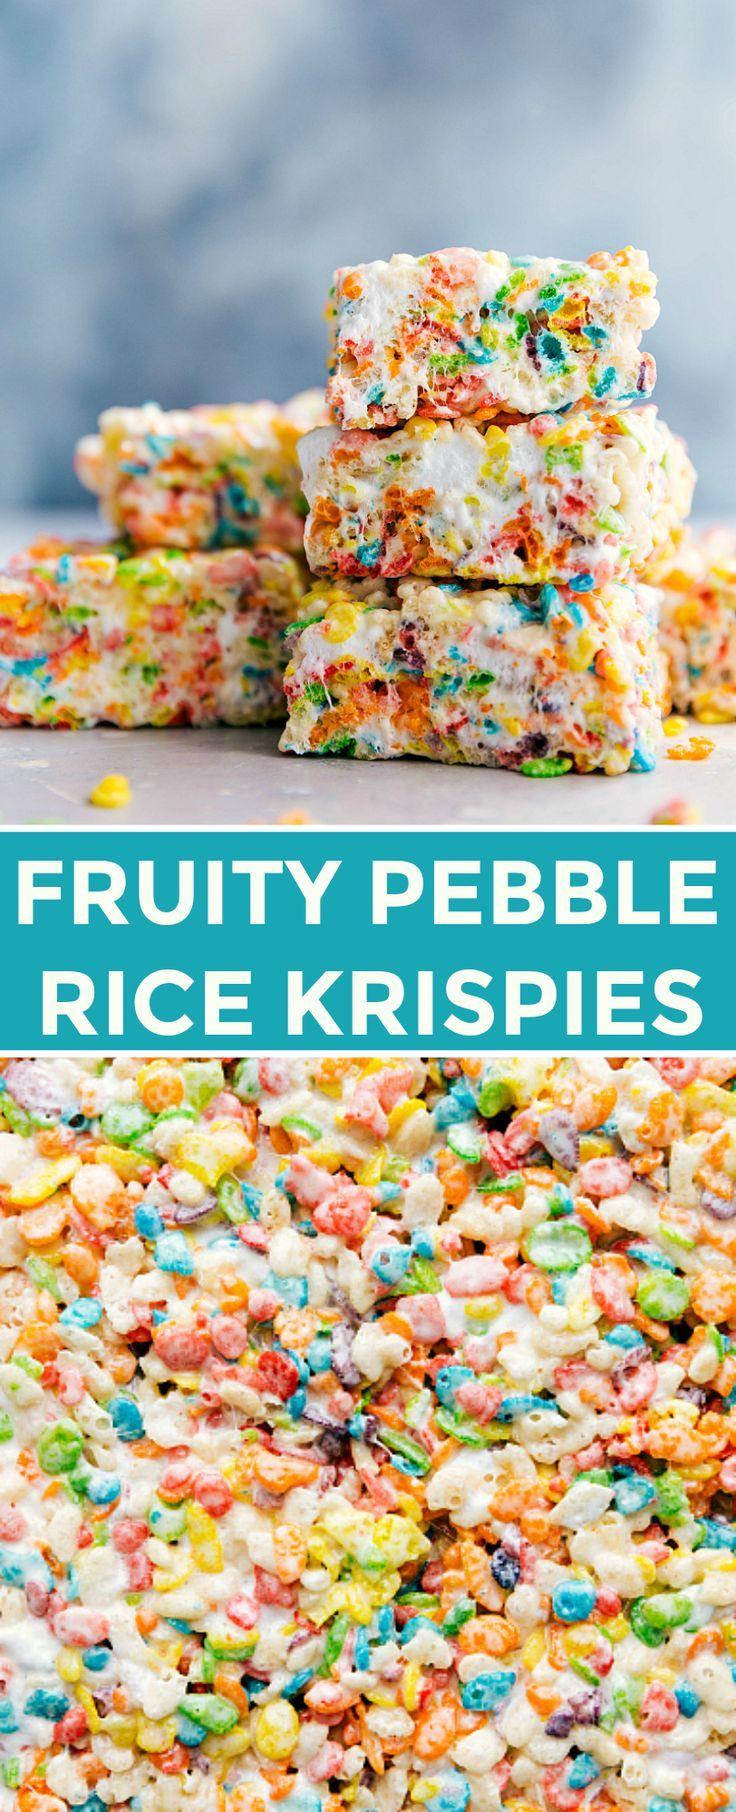 how to make fruity pebble rice crispy bars